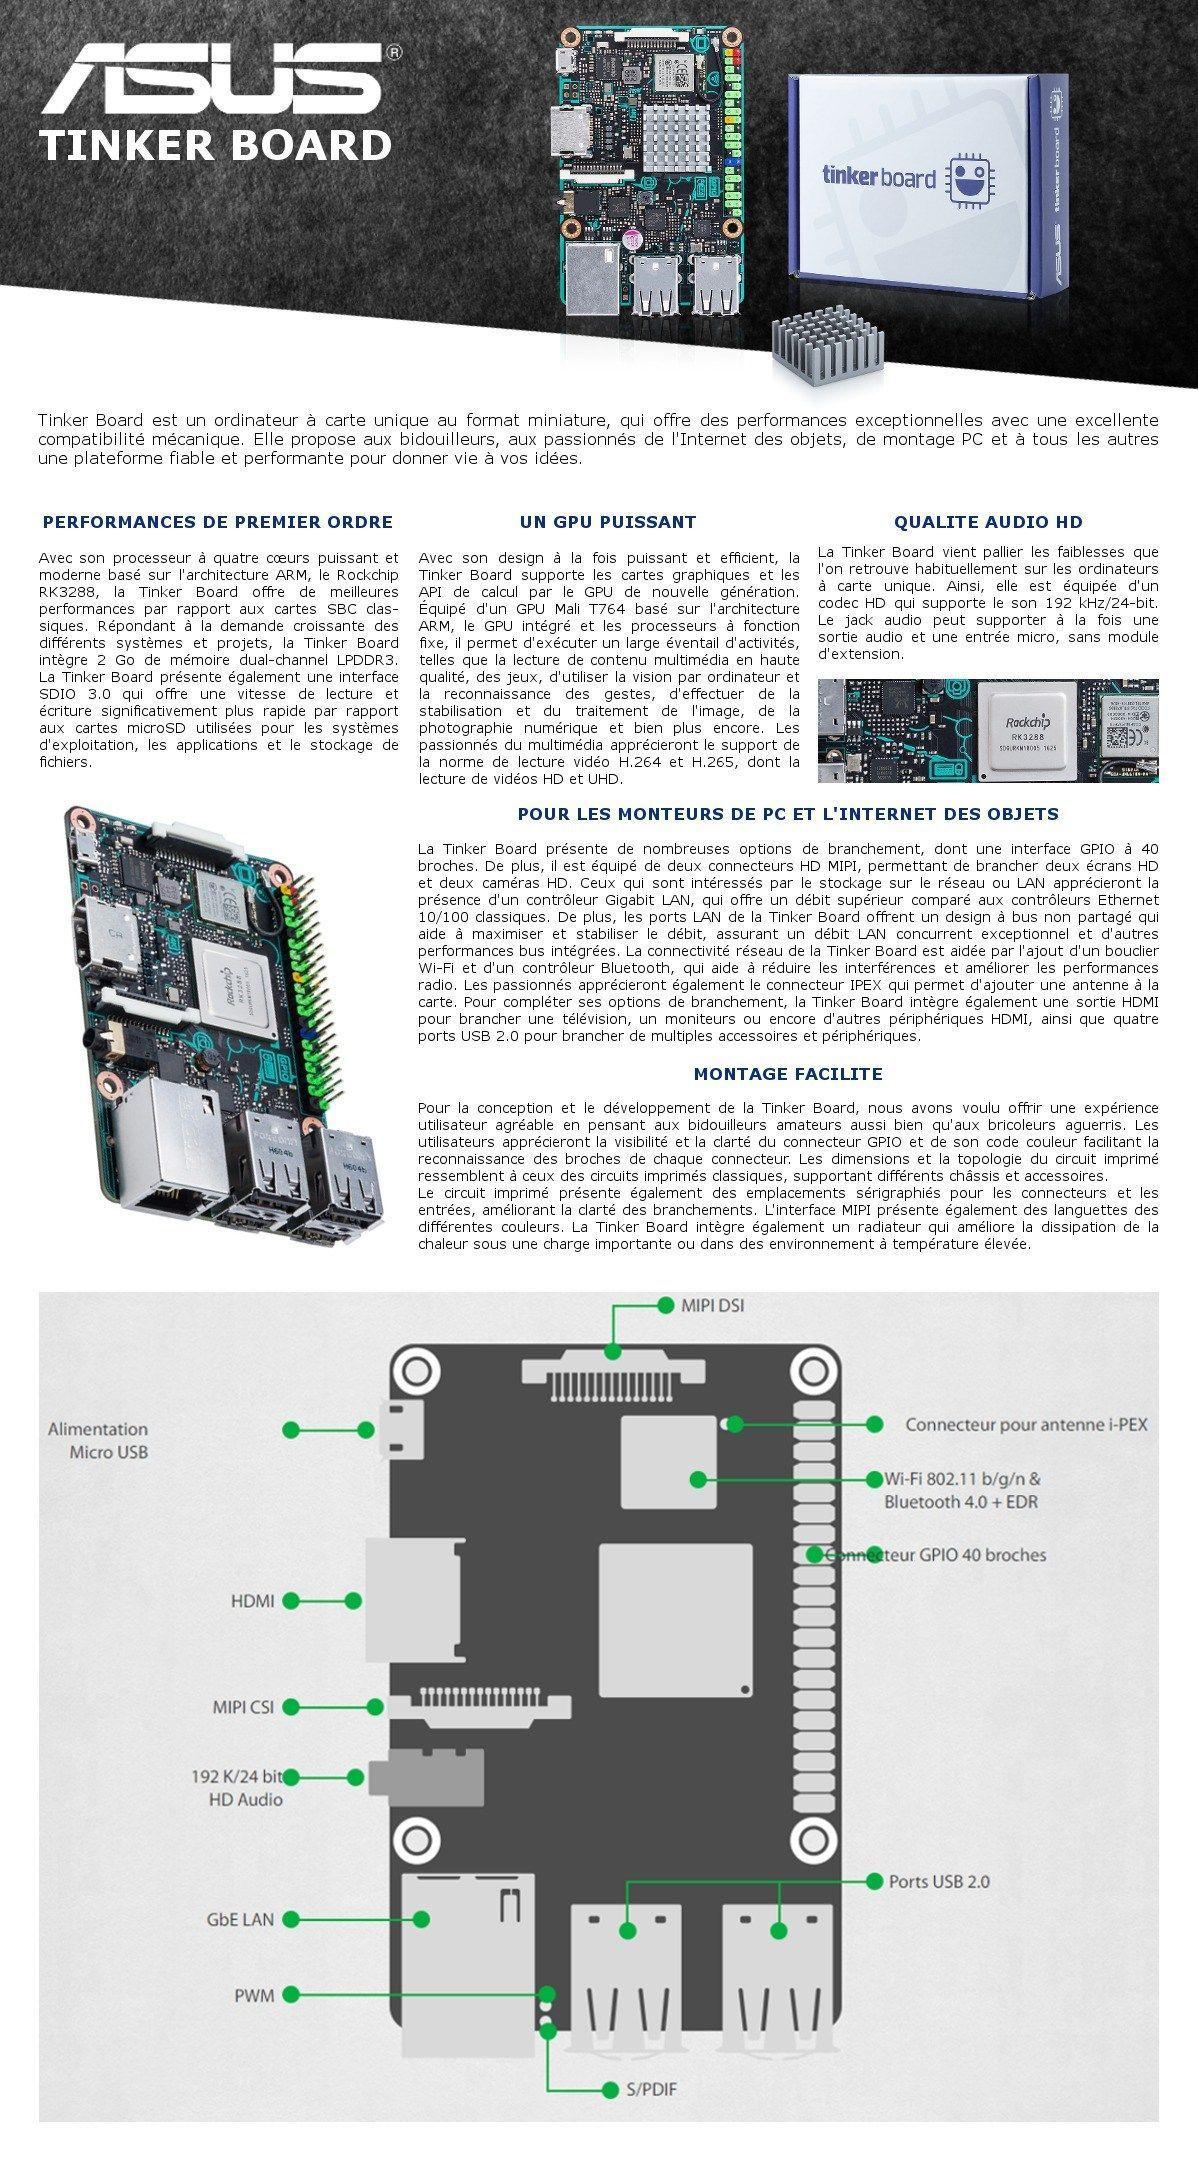 ASUS Carte mère TINKER BOARD - Rockchip RK3288 - Cortex-A17